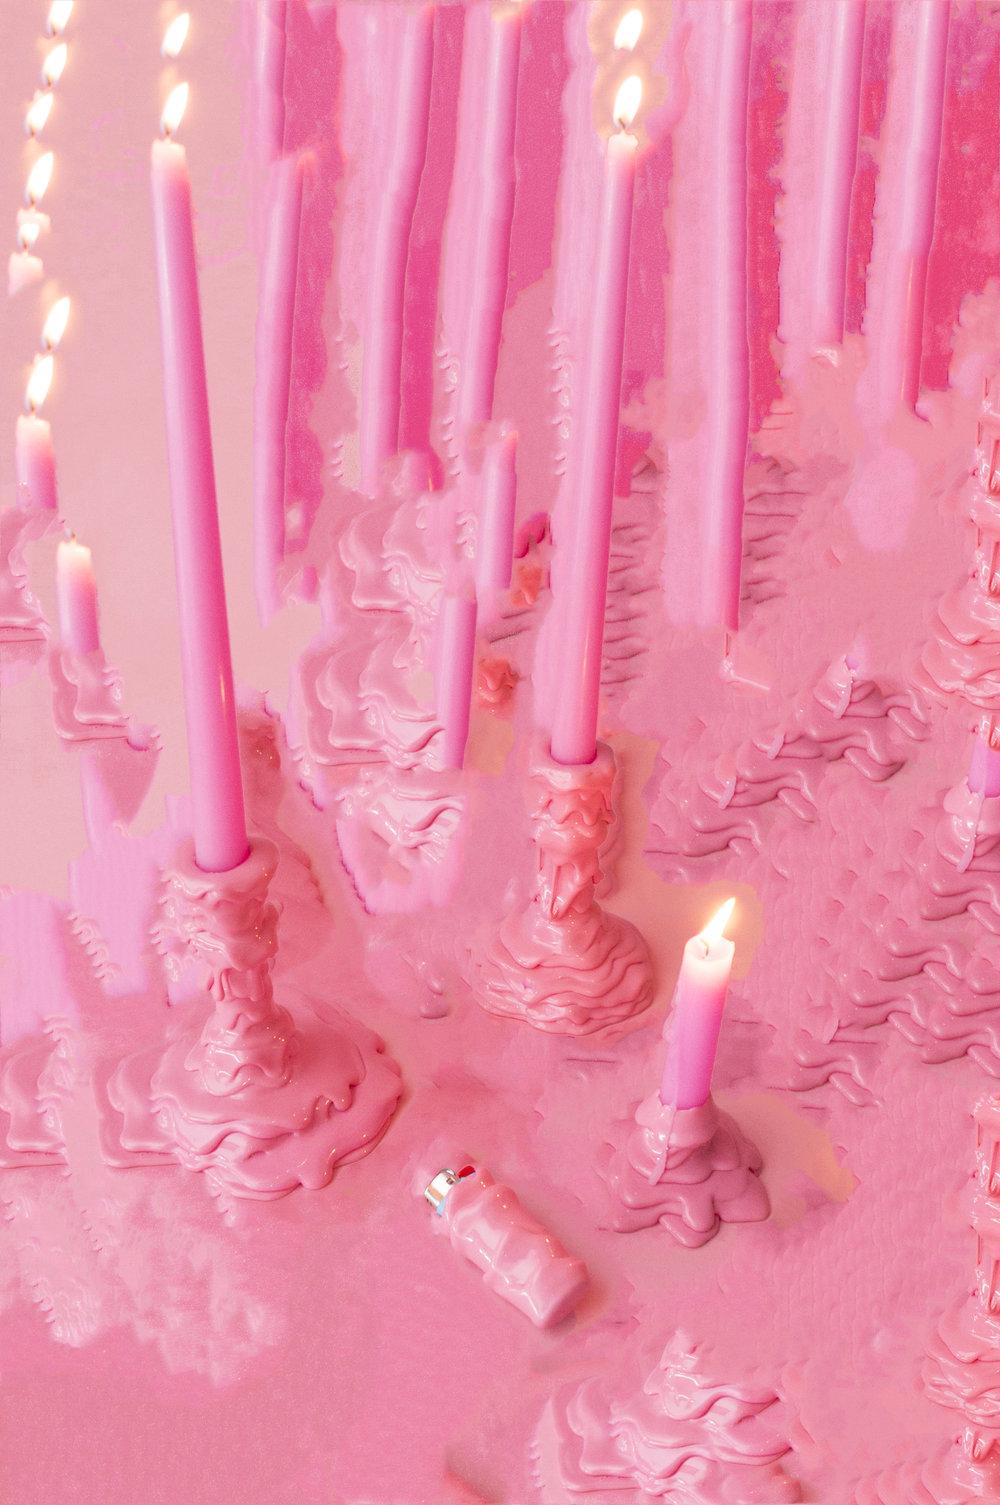 PinkCandleswithlighterpinkContent.jpg